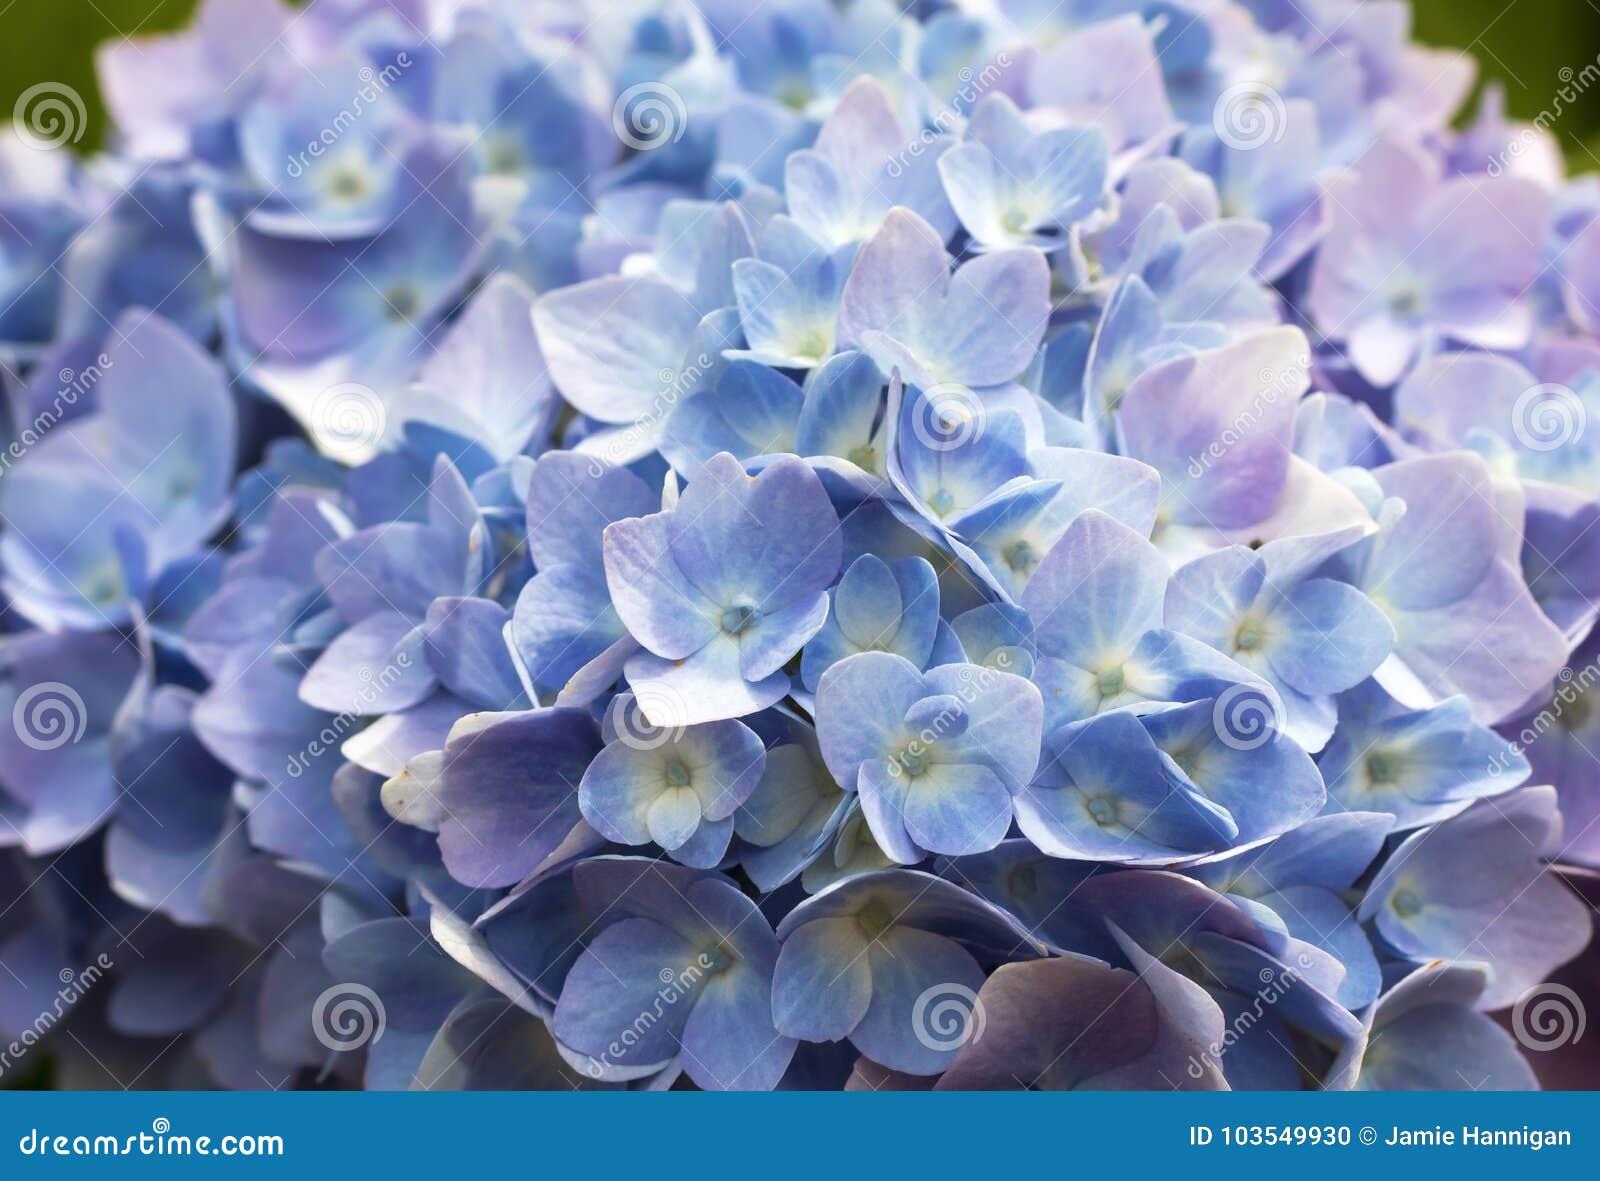 Macro blue and purple hydrangea stock photo image of blossom macro blue and purple hydrangea izmirmasajfo